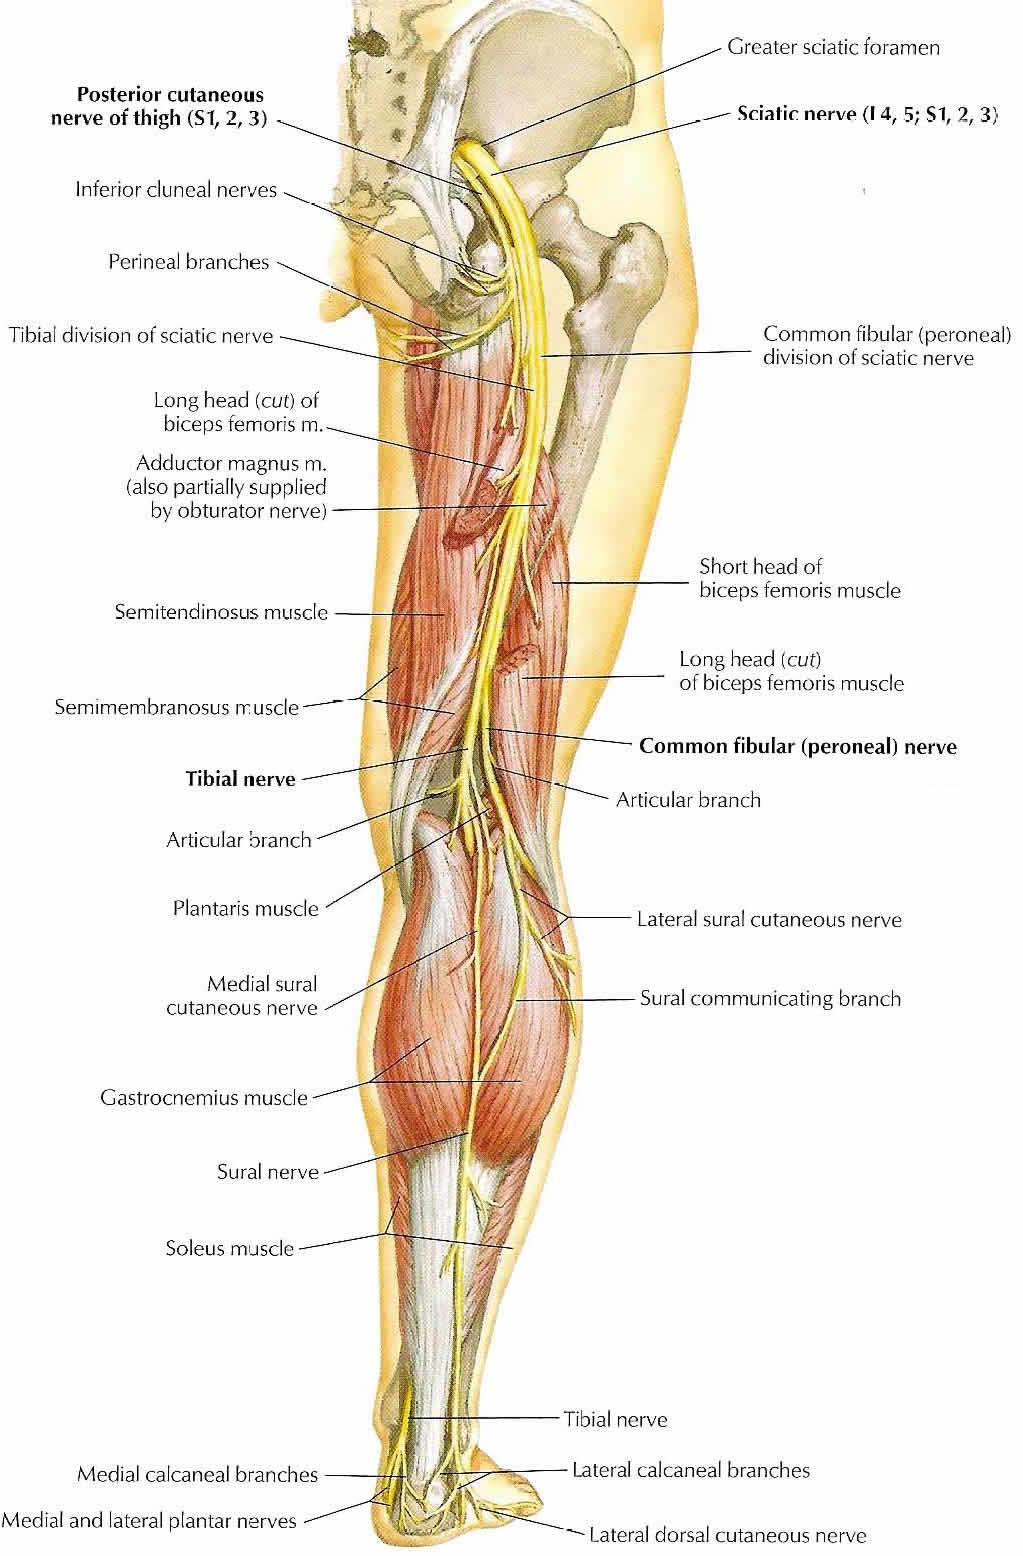 Female Nervous System Diagram Right Leg - House Wiring Diagram Symbols •